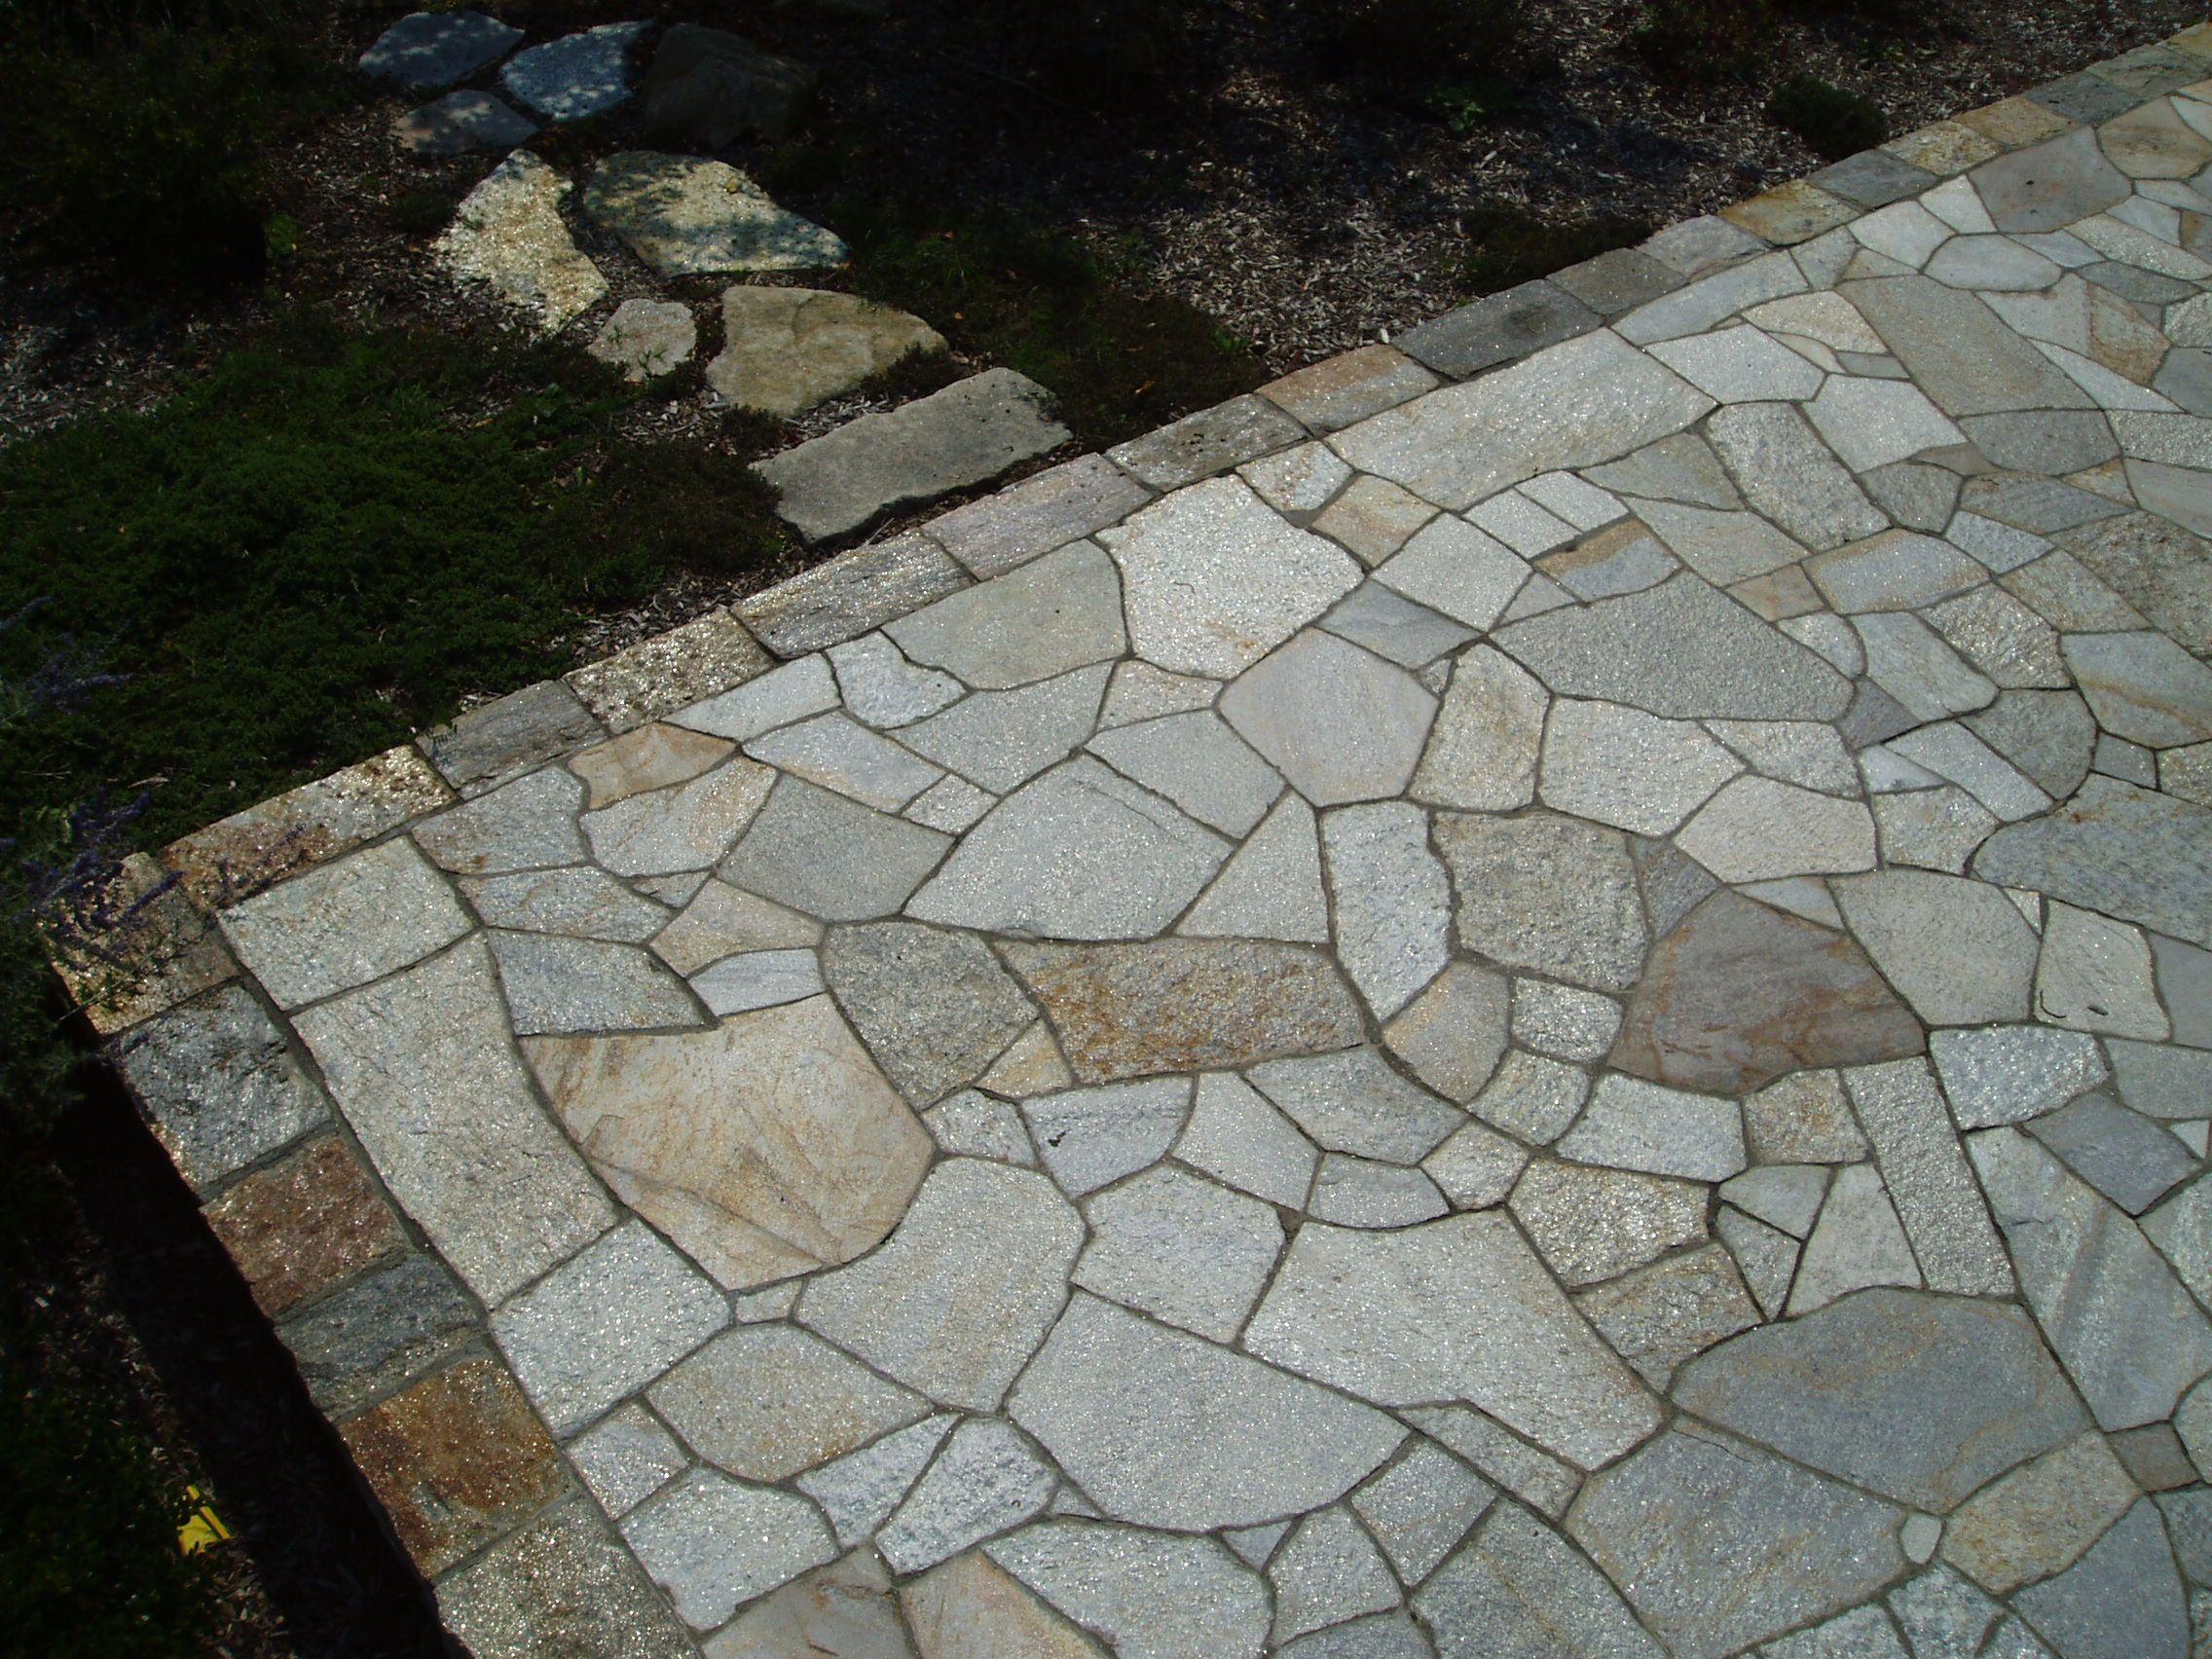 Flagstone Patio Mosaic Pattern Quartzite Stone Yard Garden - Flagstone patio patterns